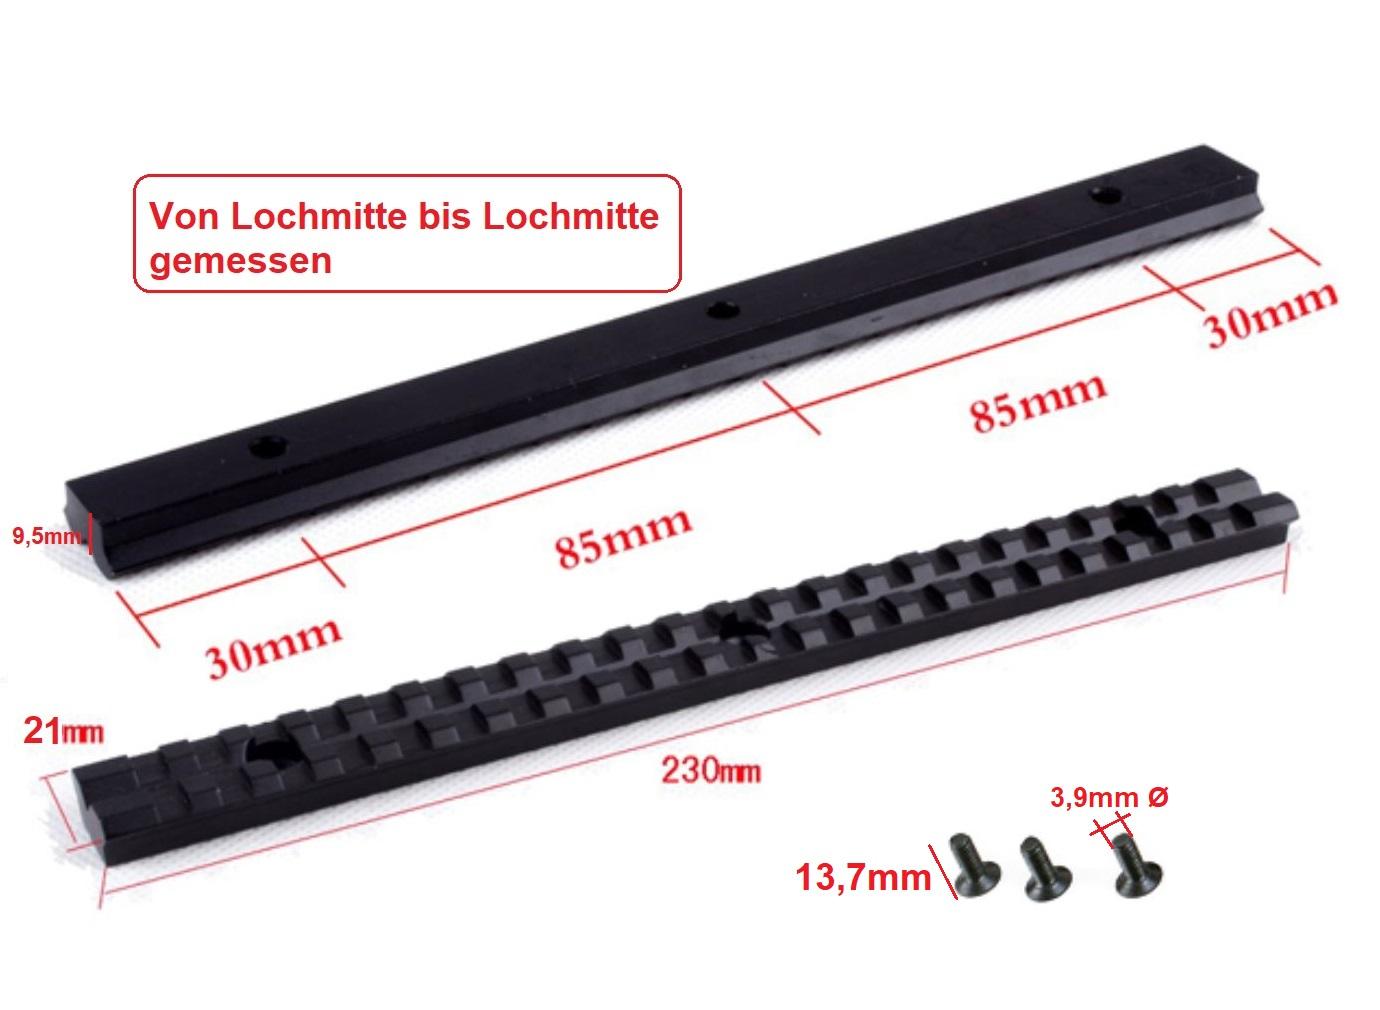 Picatinny Weaver Schiene 230mm lang 21mm flacher Boden 3 Bohrungen Jagd Alu